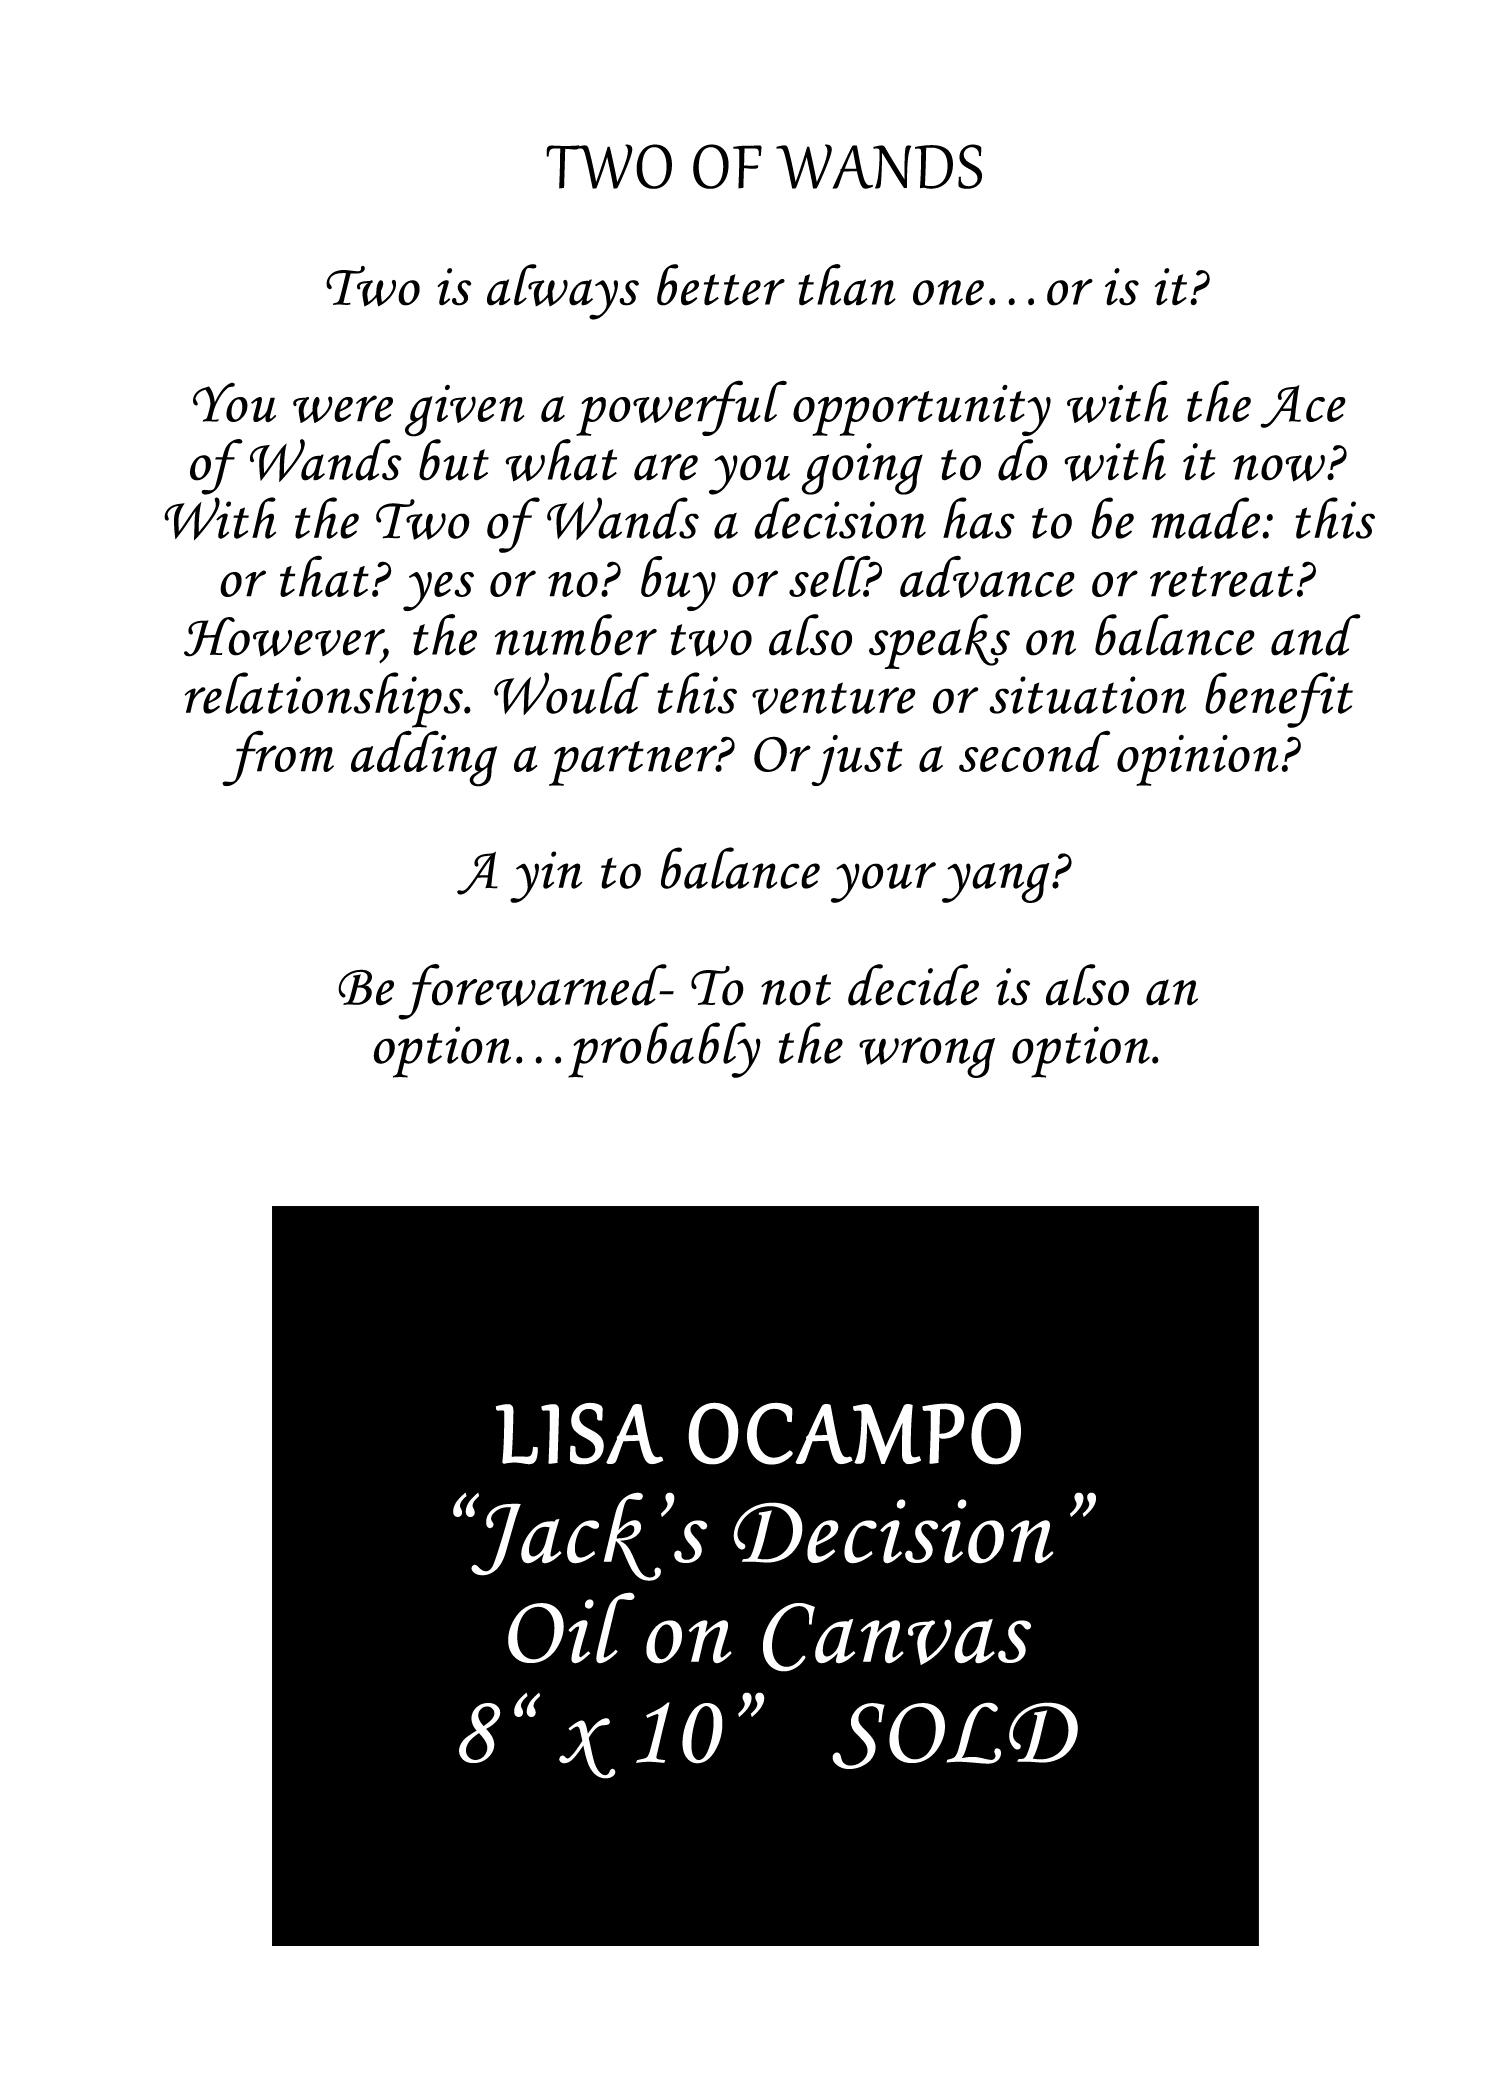 Lisa-Ocampo-Jacks-Decision-Two-Of-Wands-15.jpg